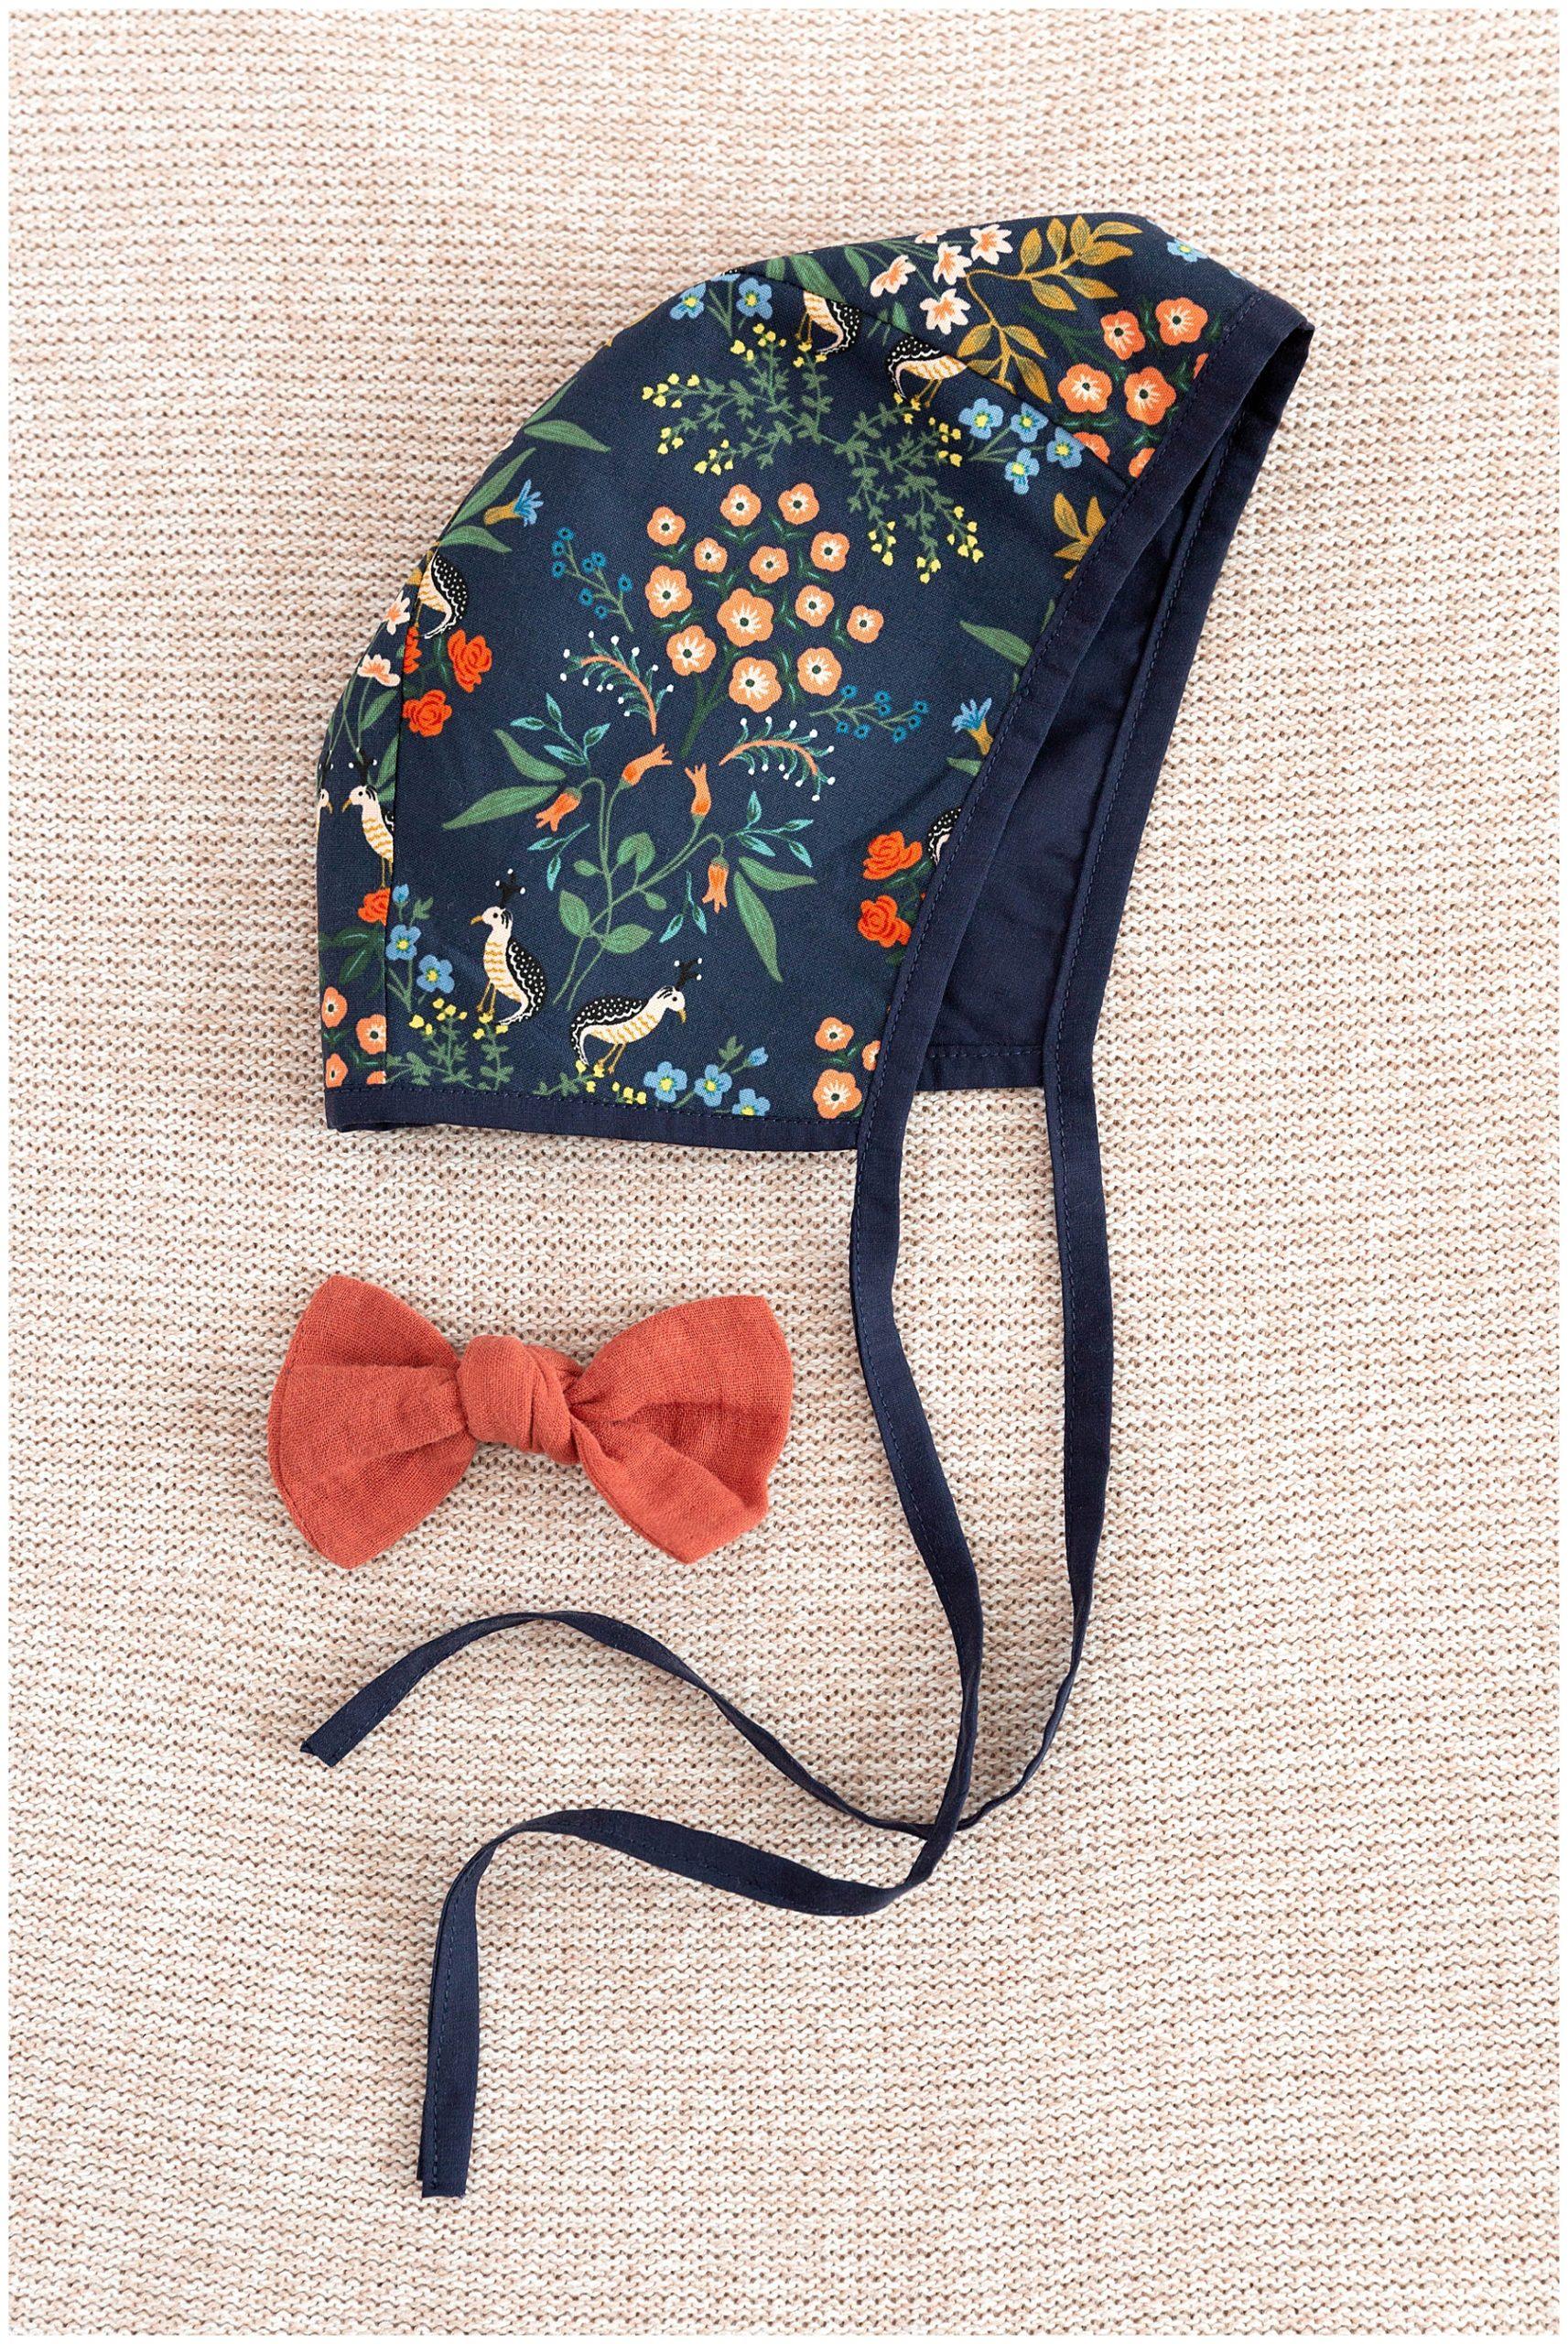 baby bonnets, utah product photographer, utah baby bonnets, baby bows